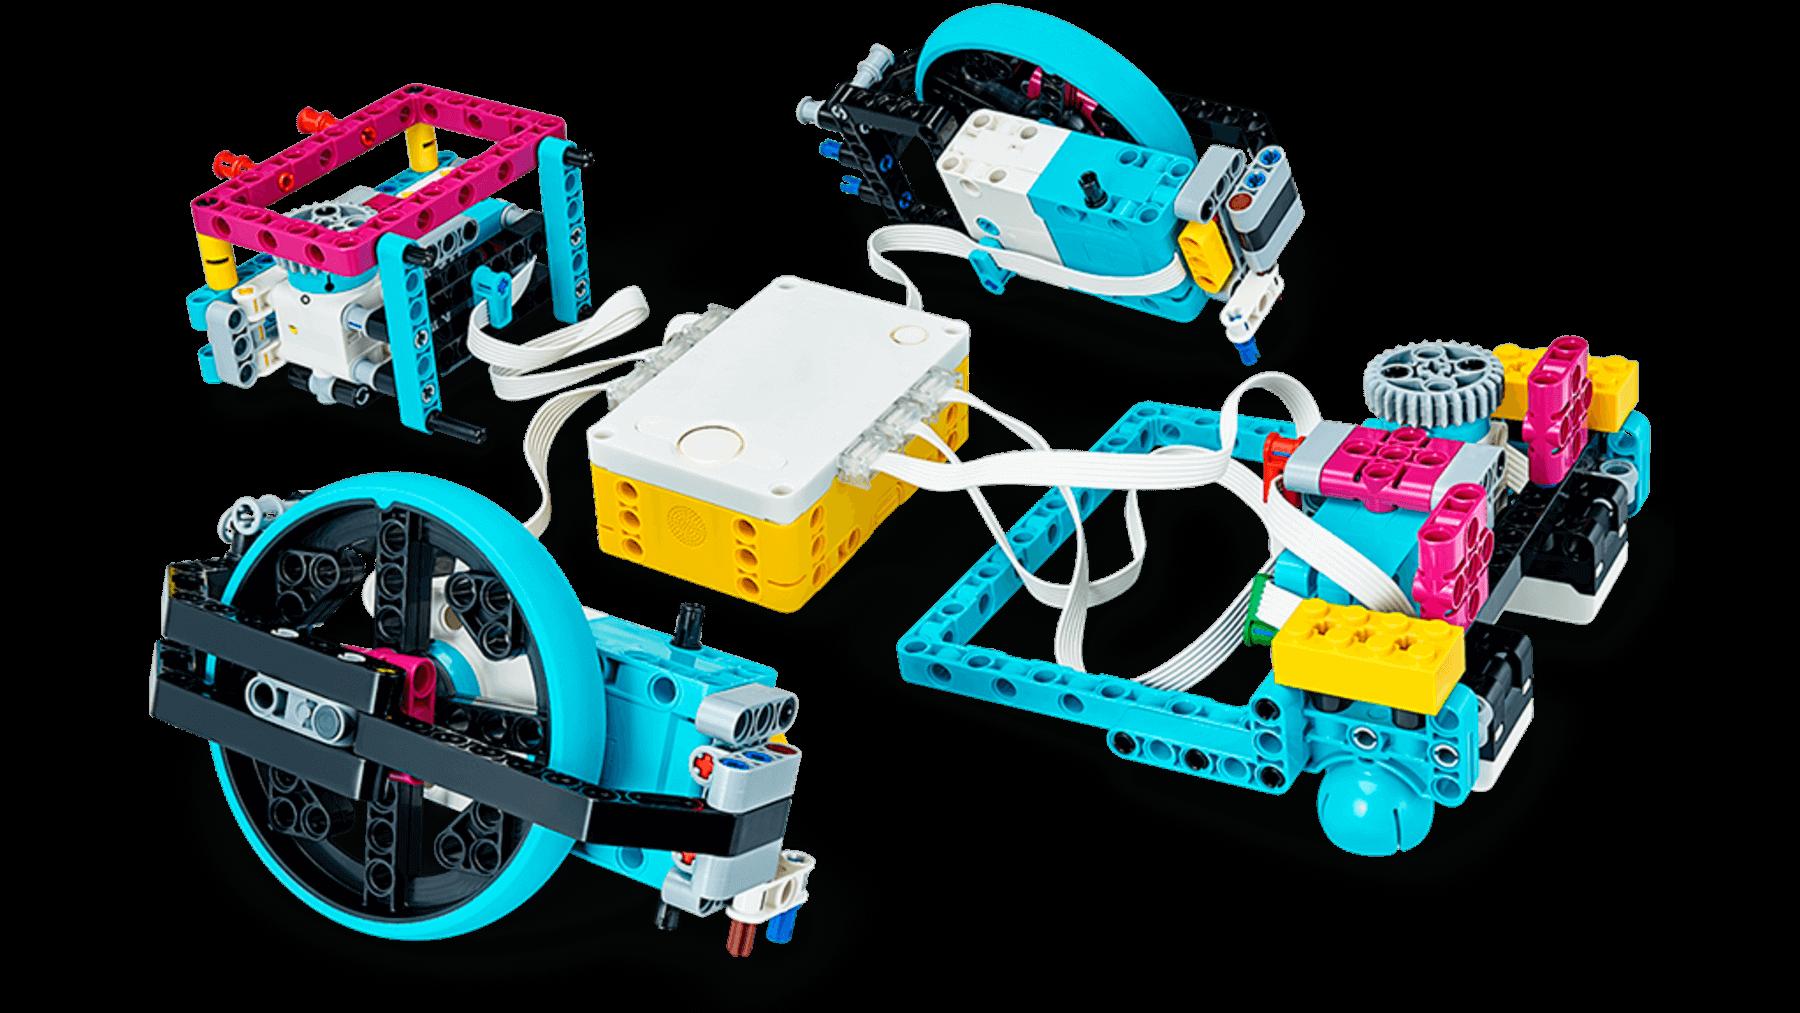 LEGO education_ SPIKE prime_45680_Erzänzung_competition_ready_assemblinganadvanceddrivingbase_01